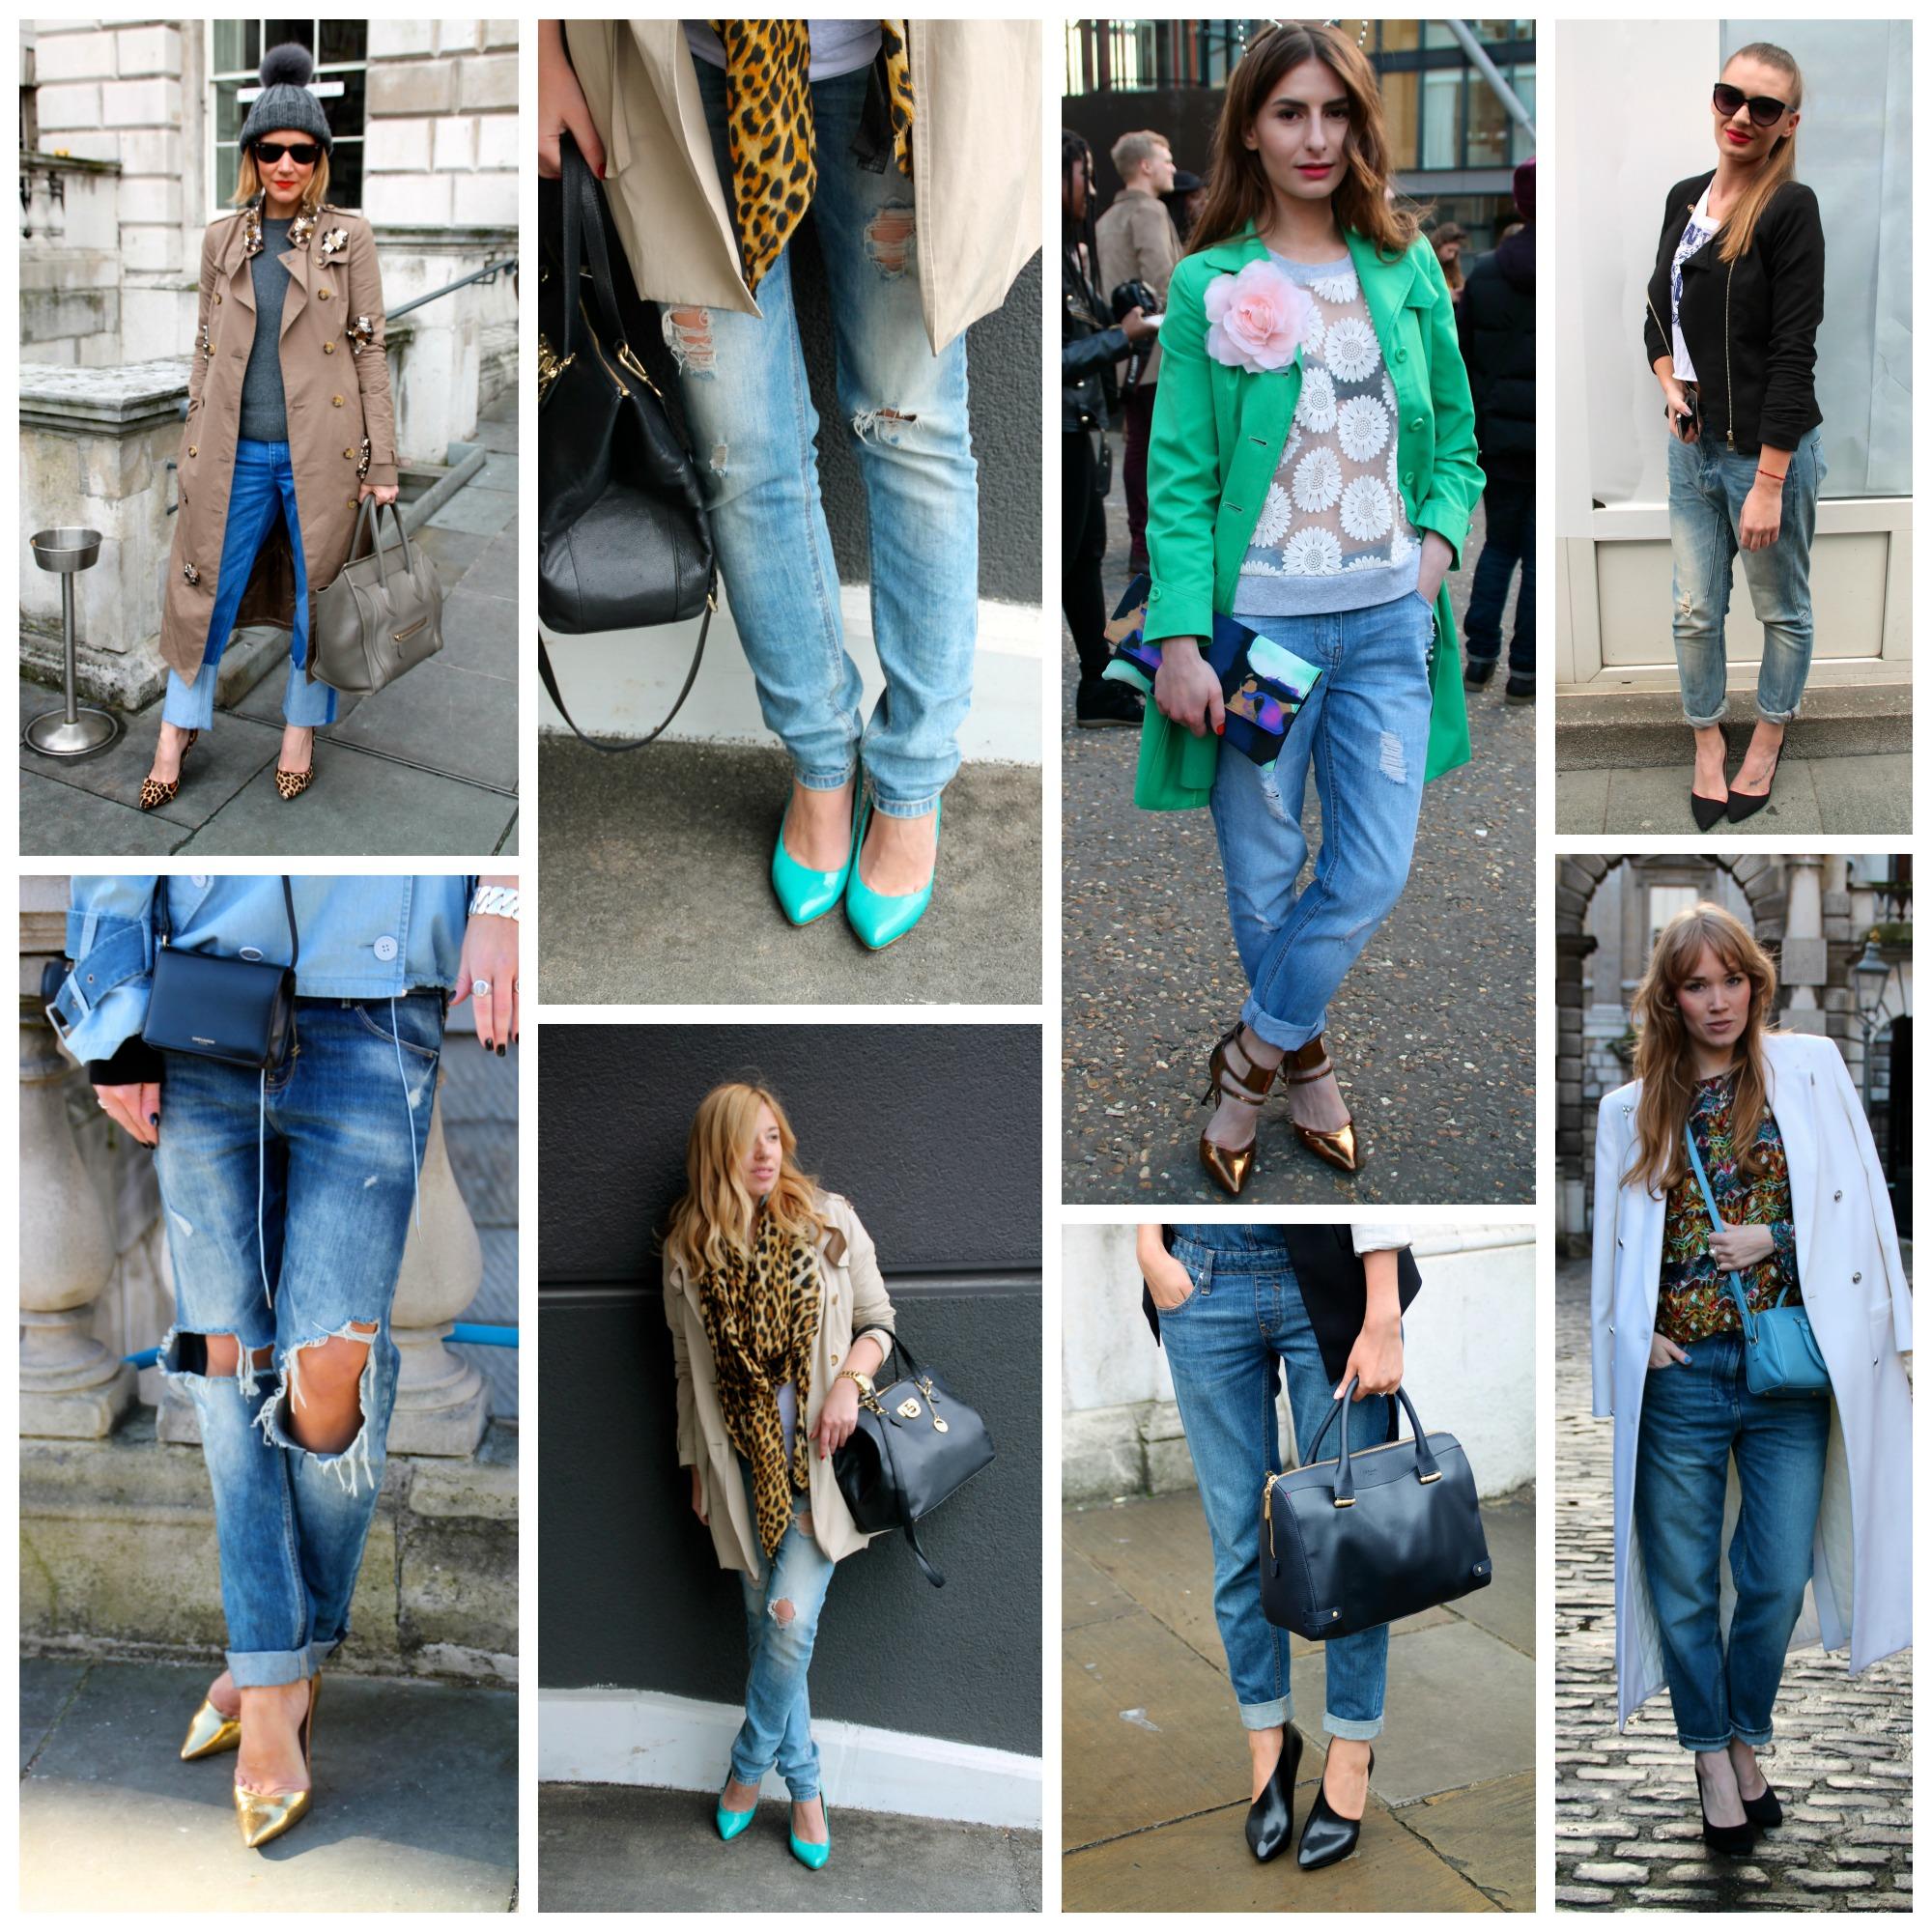 jeans&stilettos